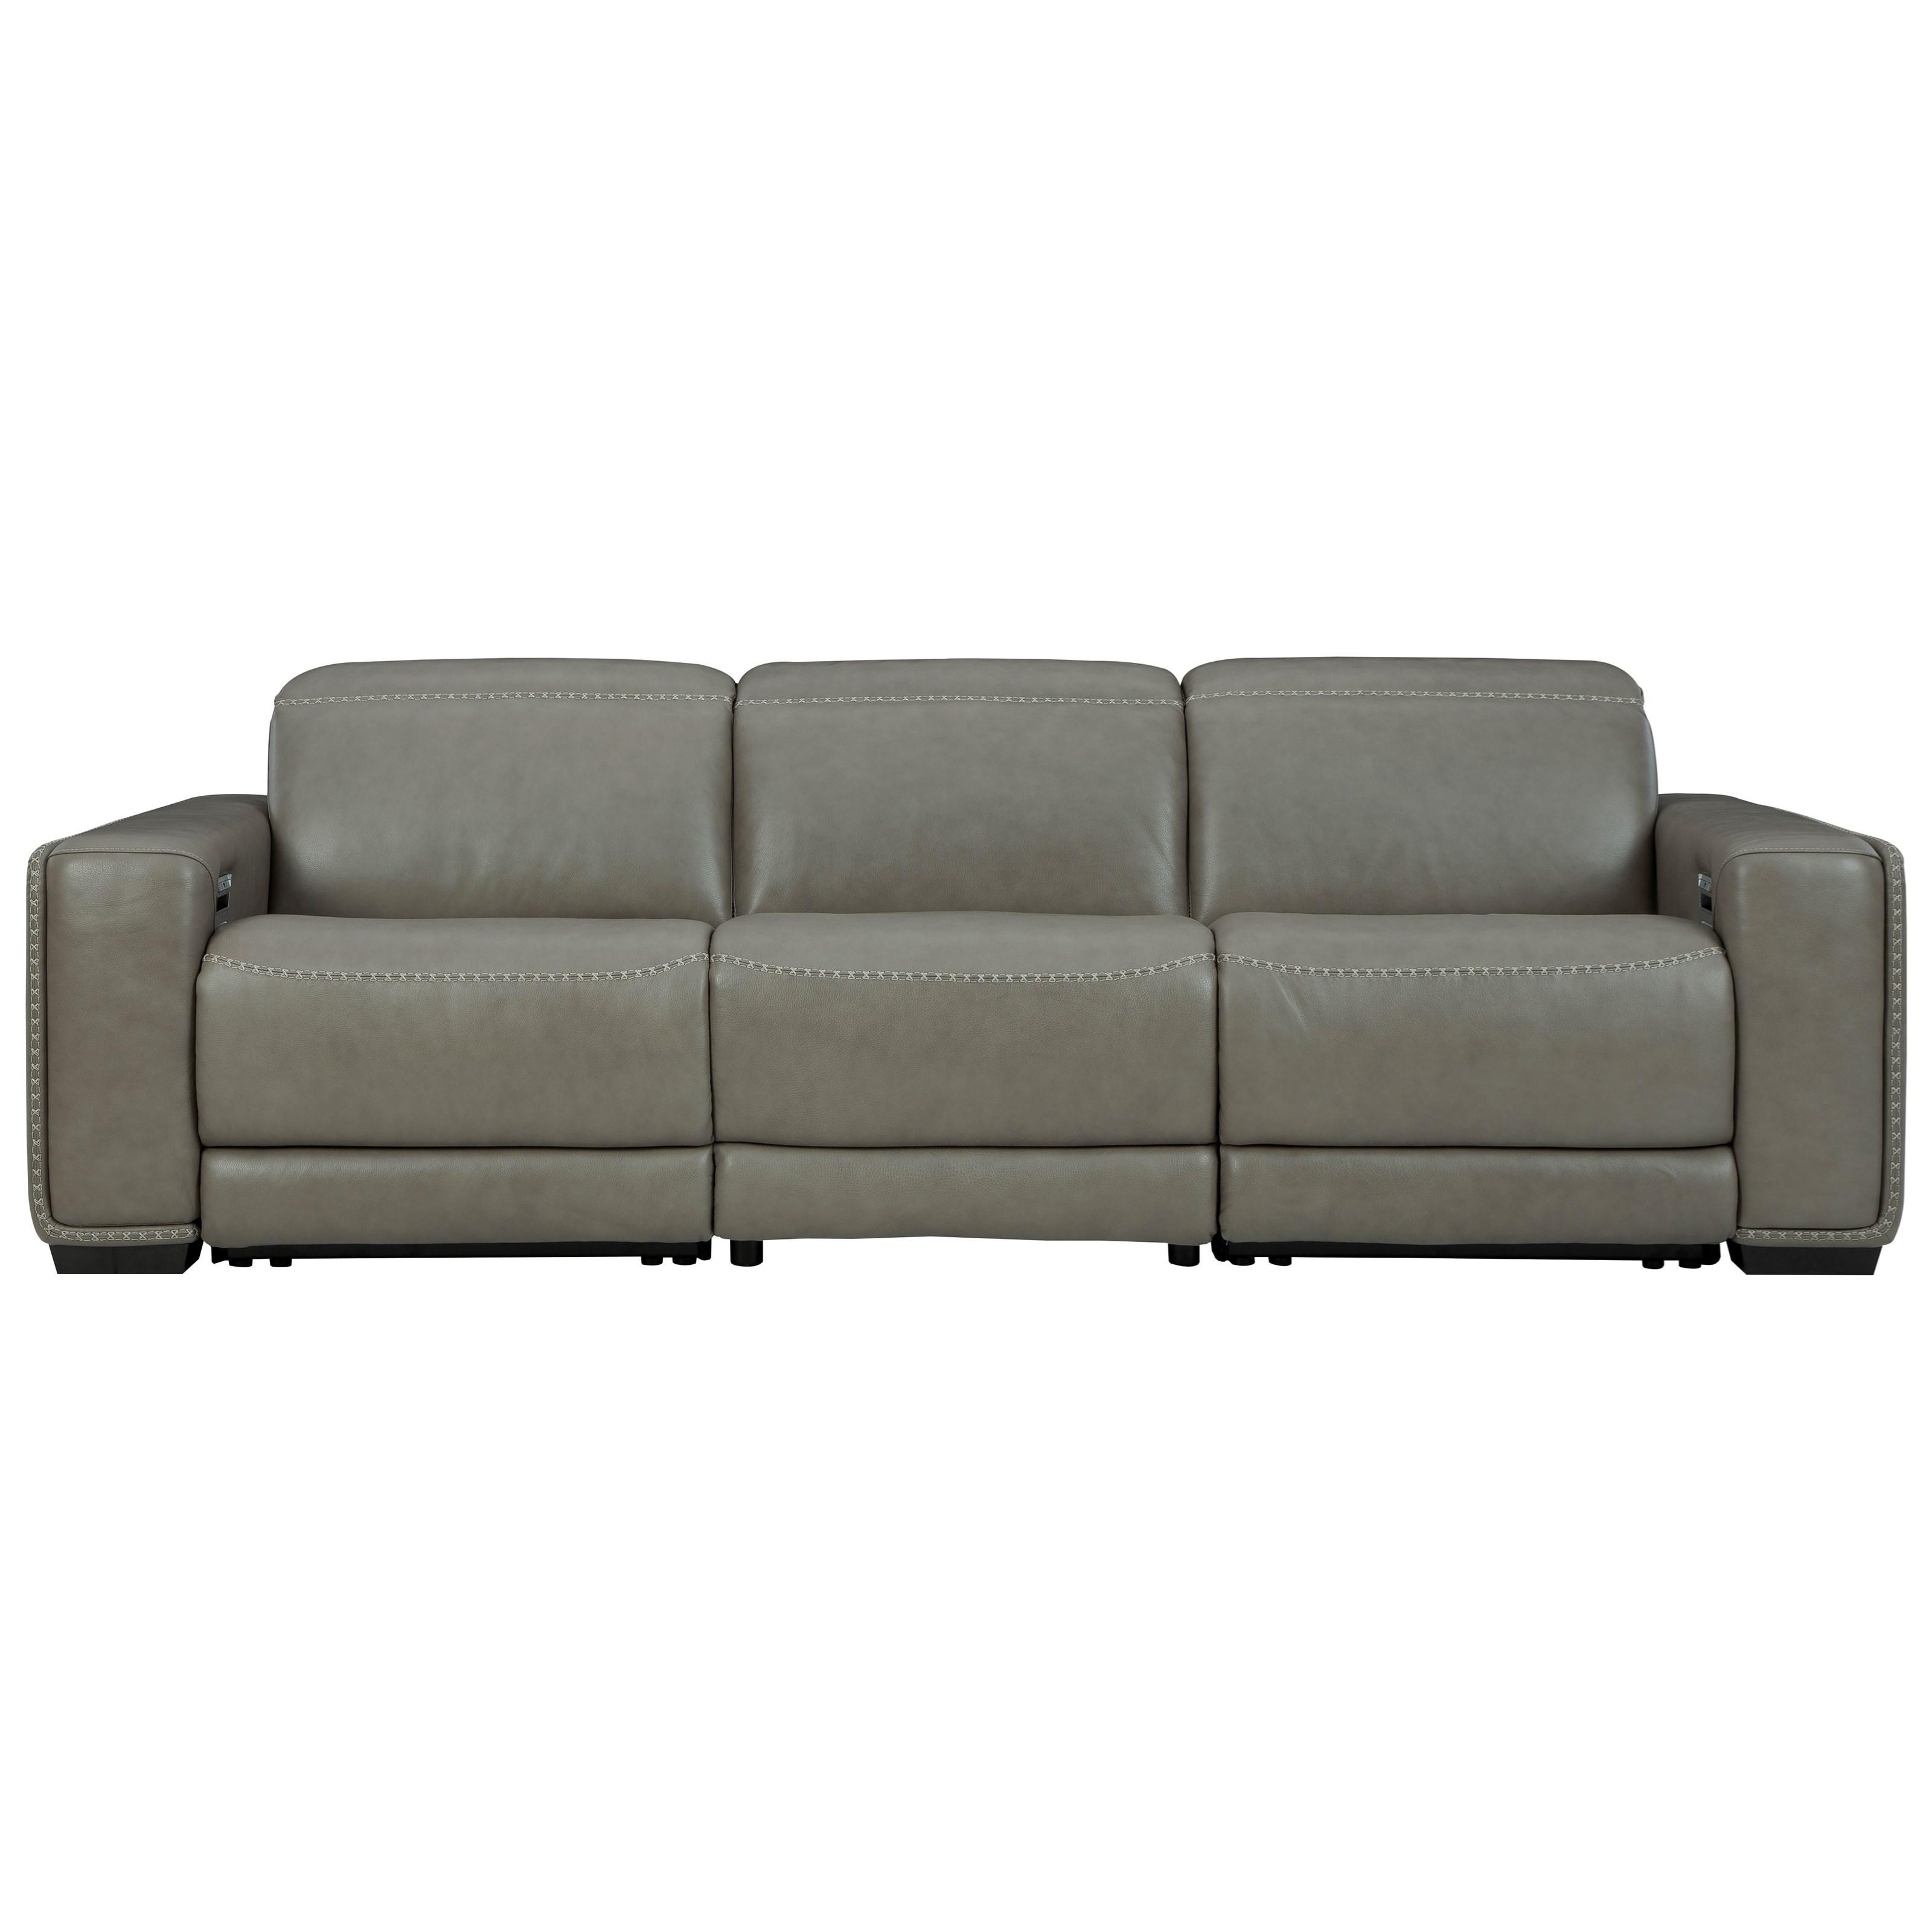 Correze Power Reclining Sofa by Ashley (Signature Design) at Johnny Janosik